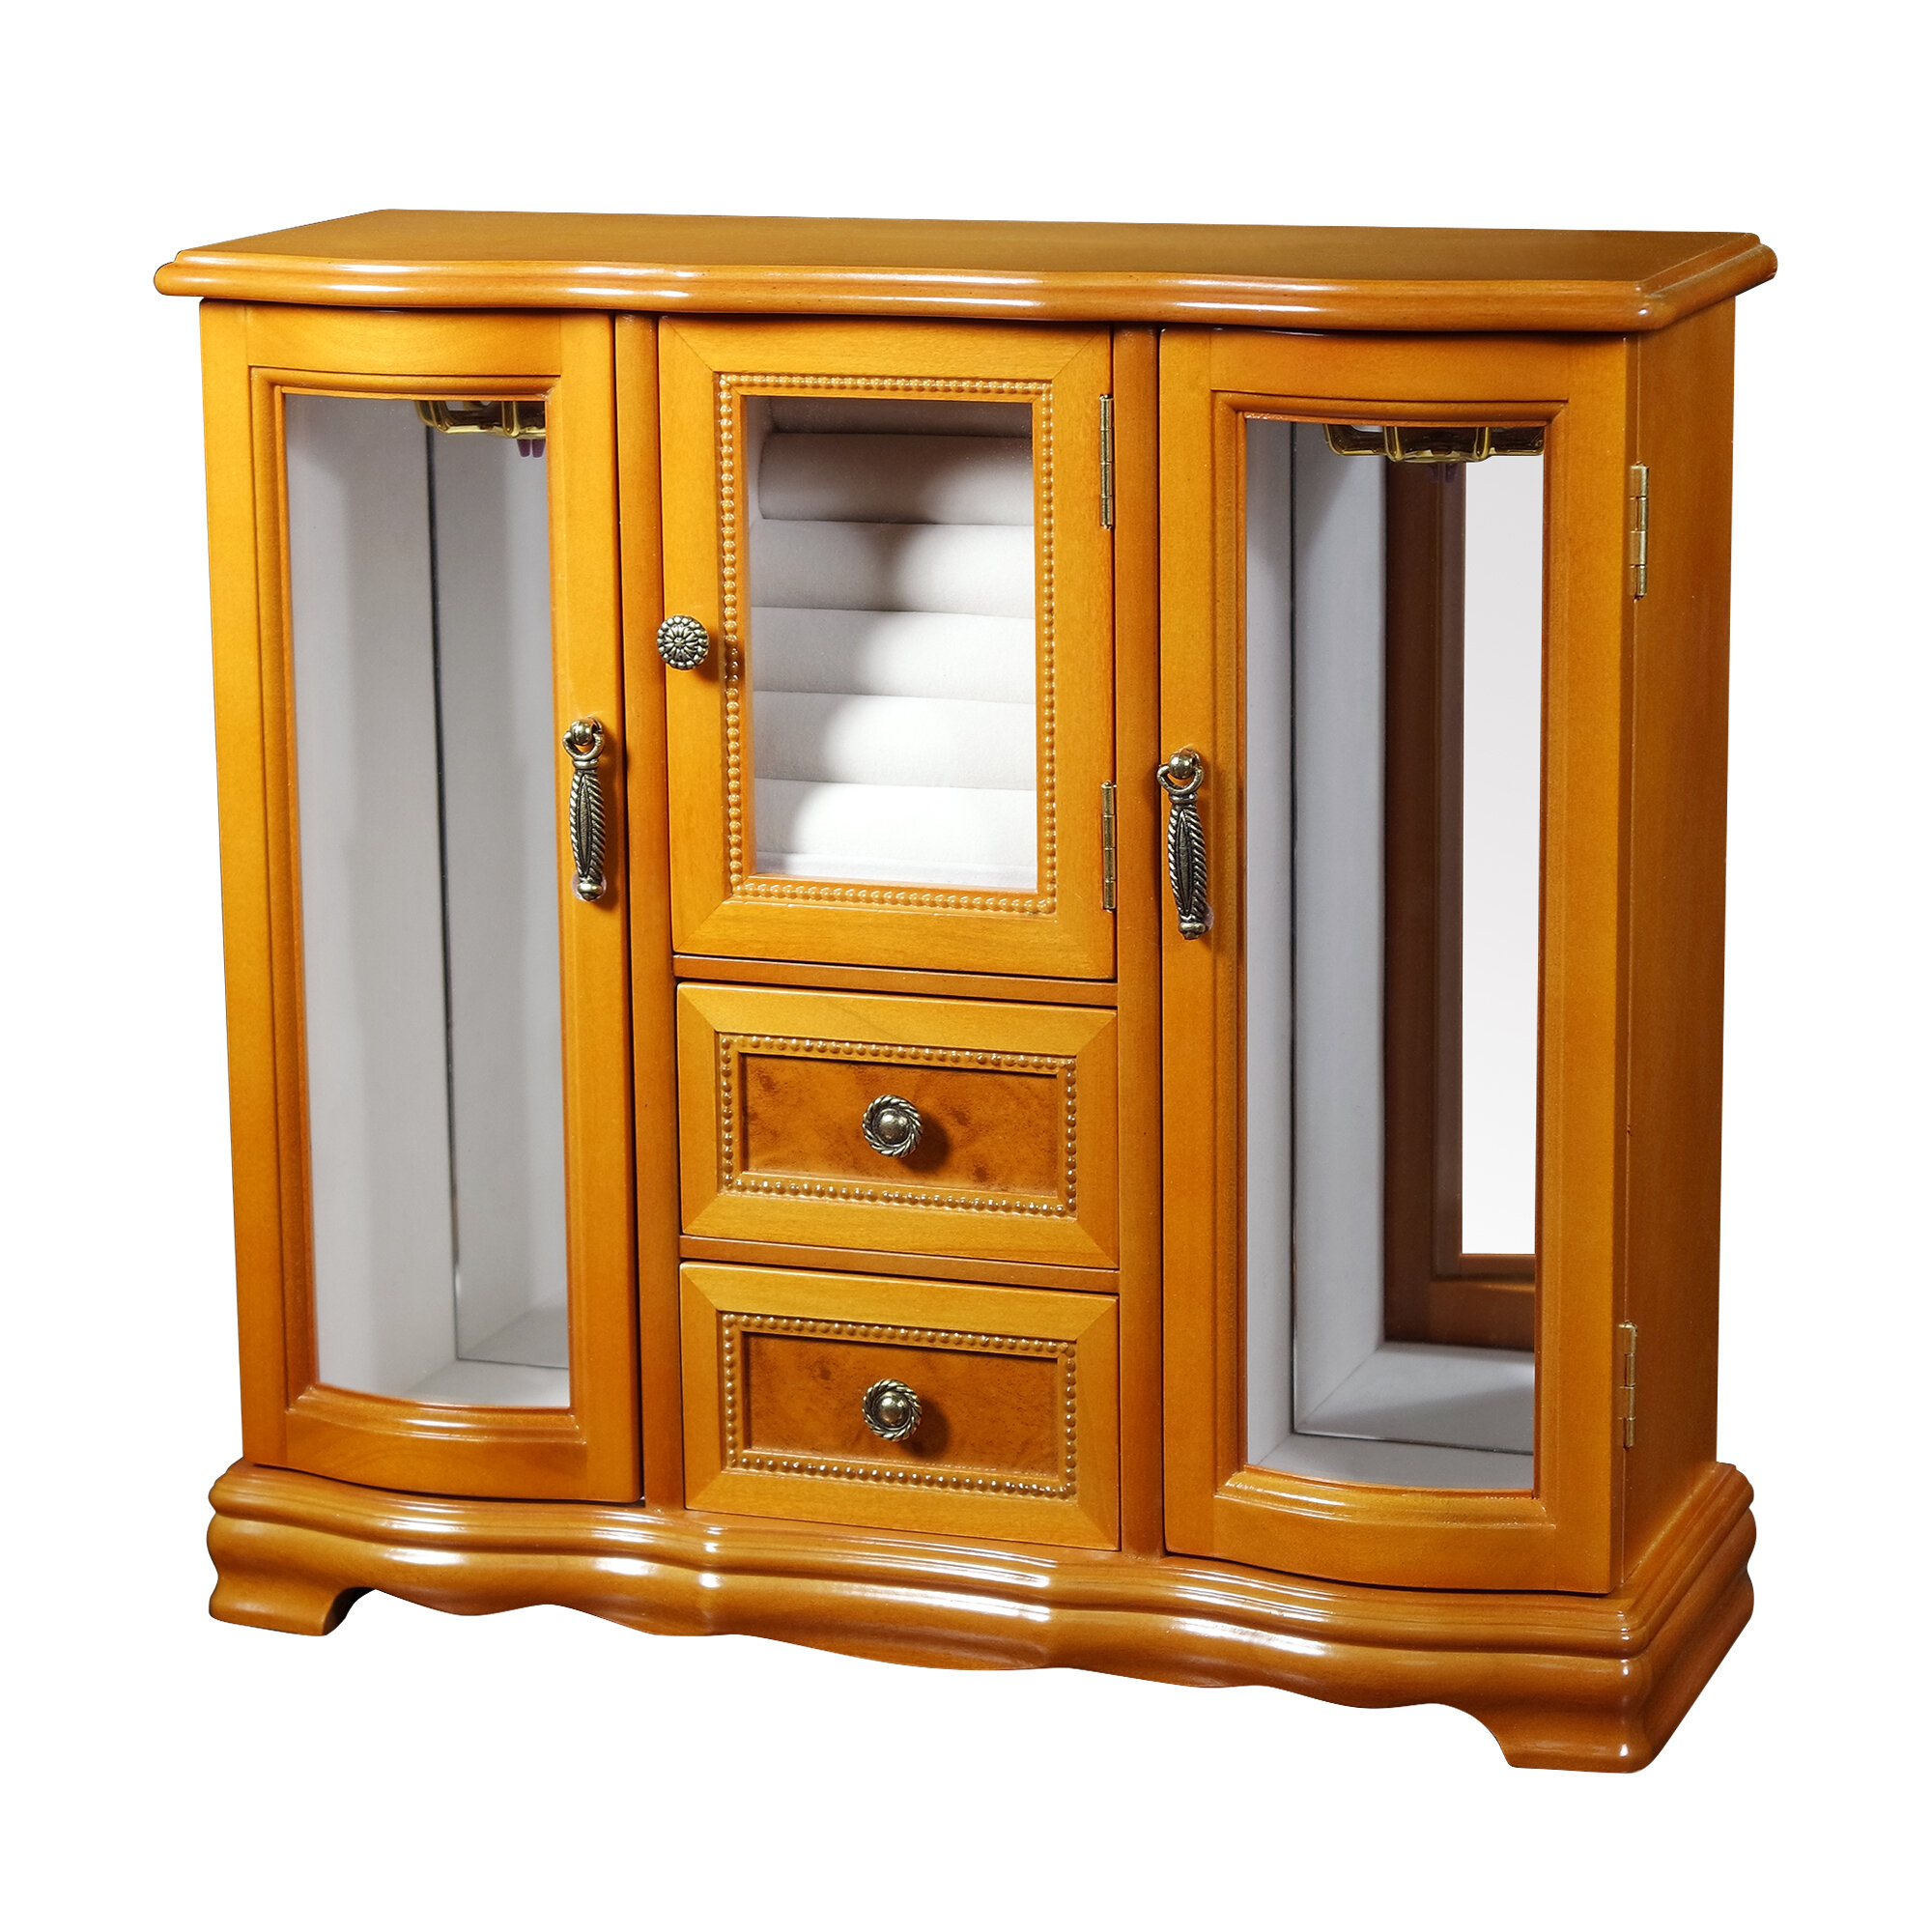 Darby Home Co Glass Door Jewelry Box Reviews Wayfair